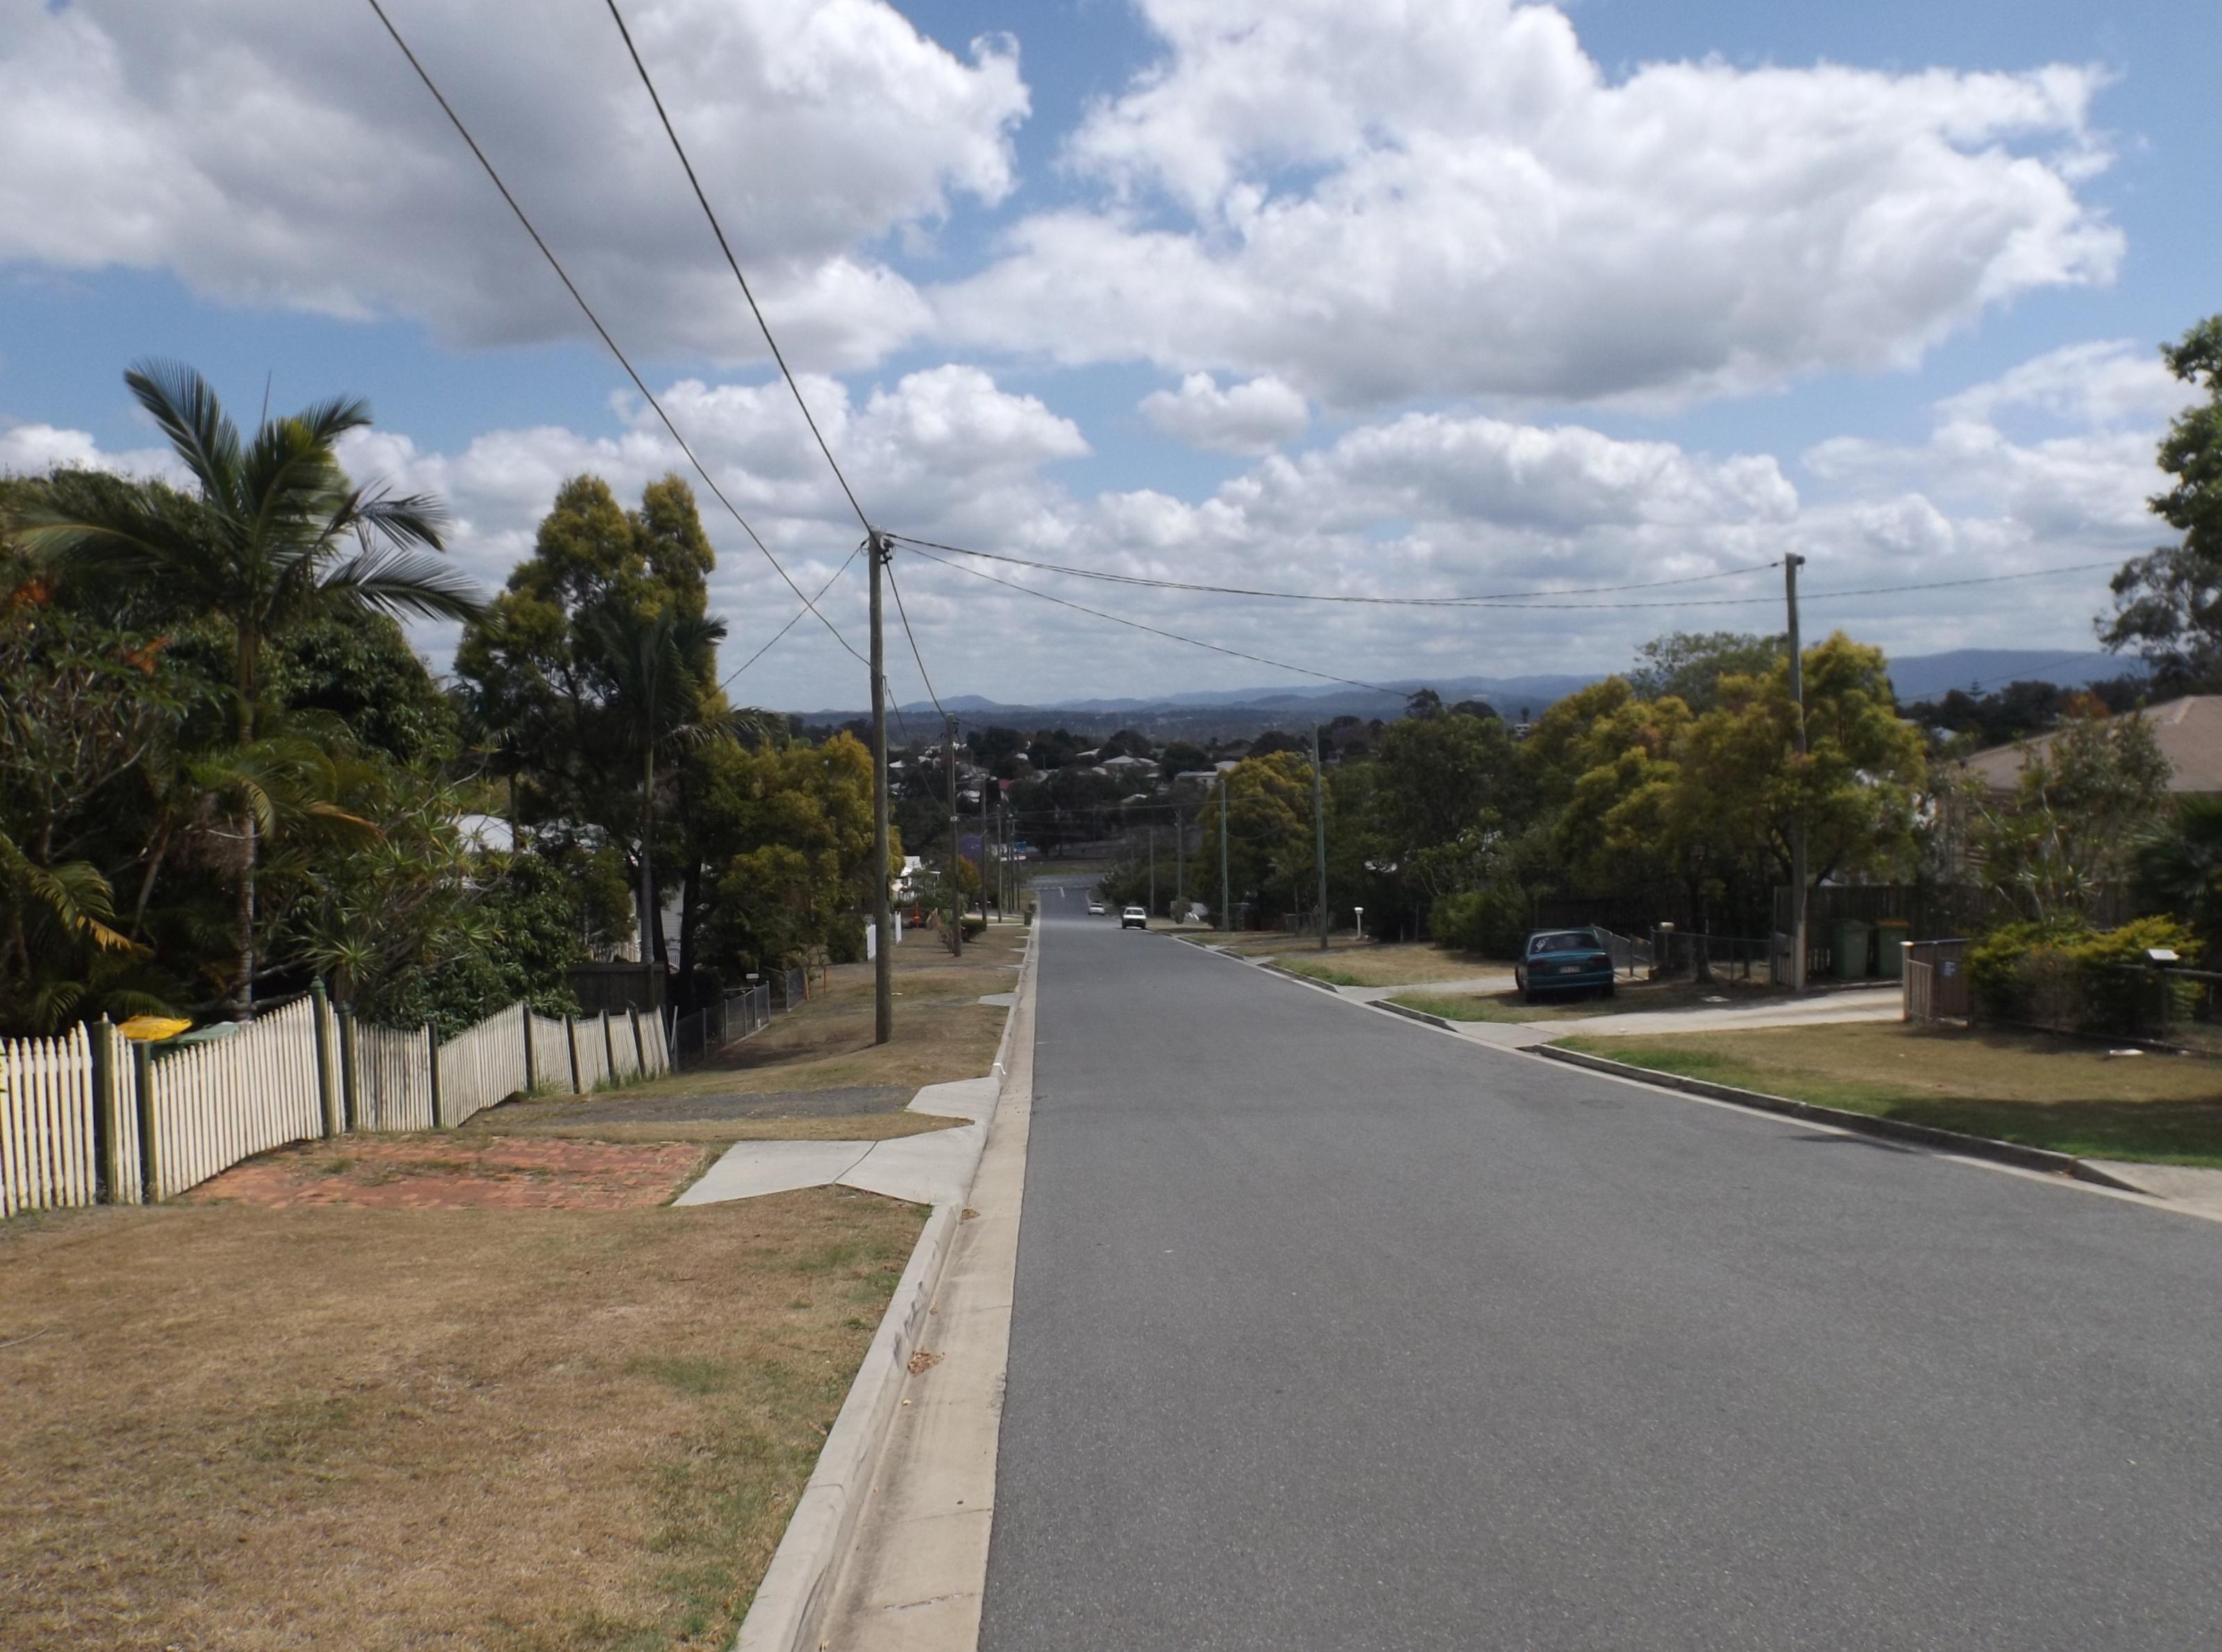 File:Braeside Road, Bundamba, Queensland.jpg - Wikipedia